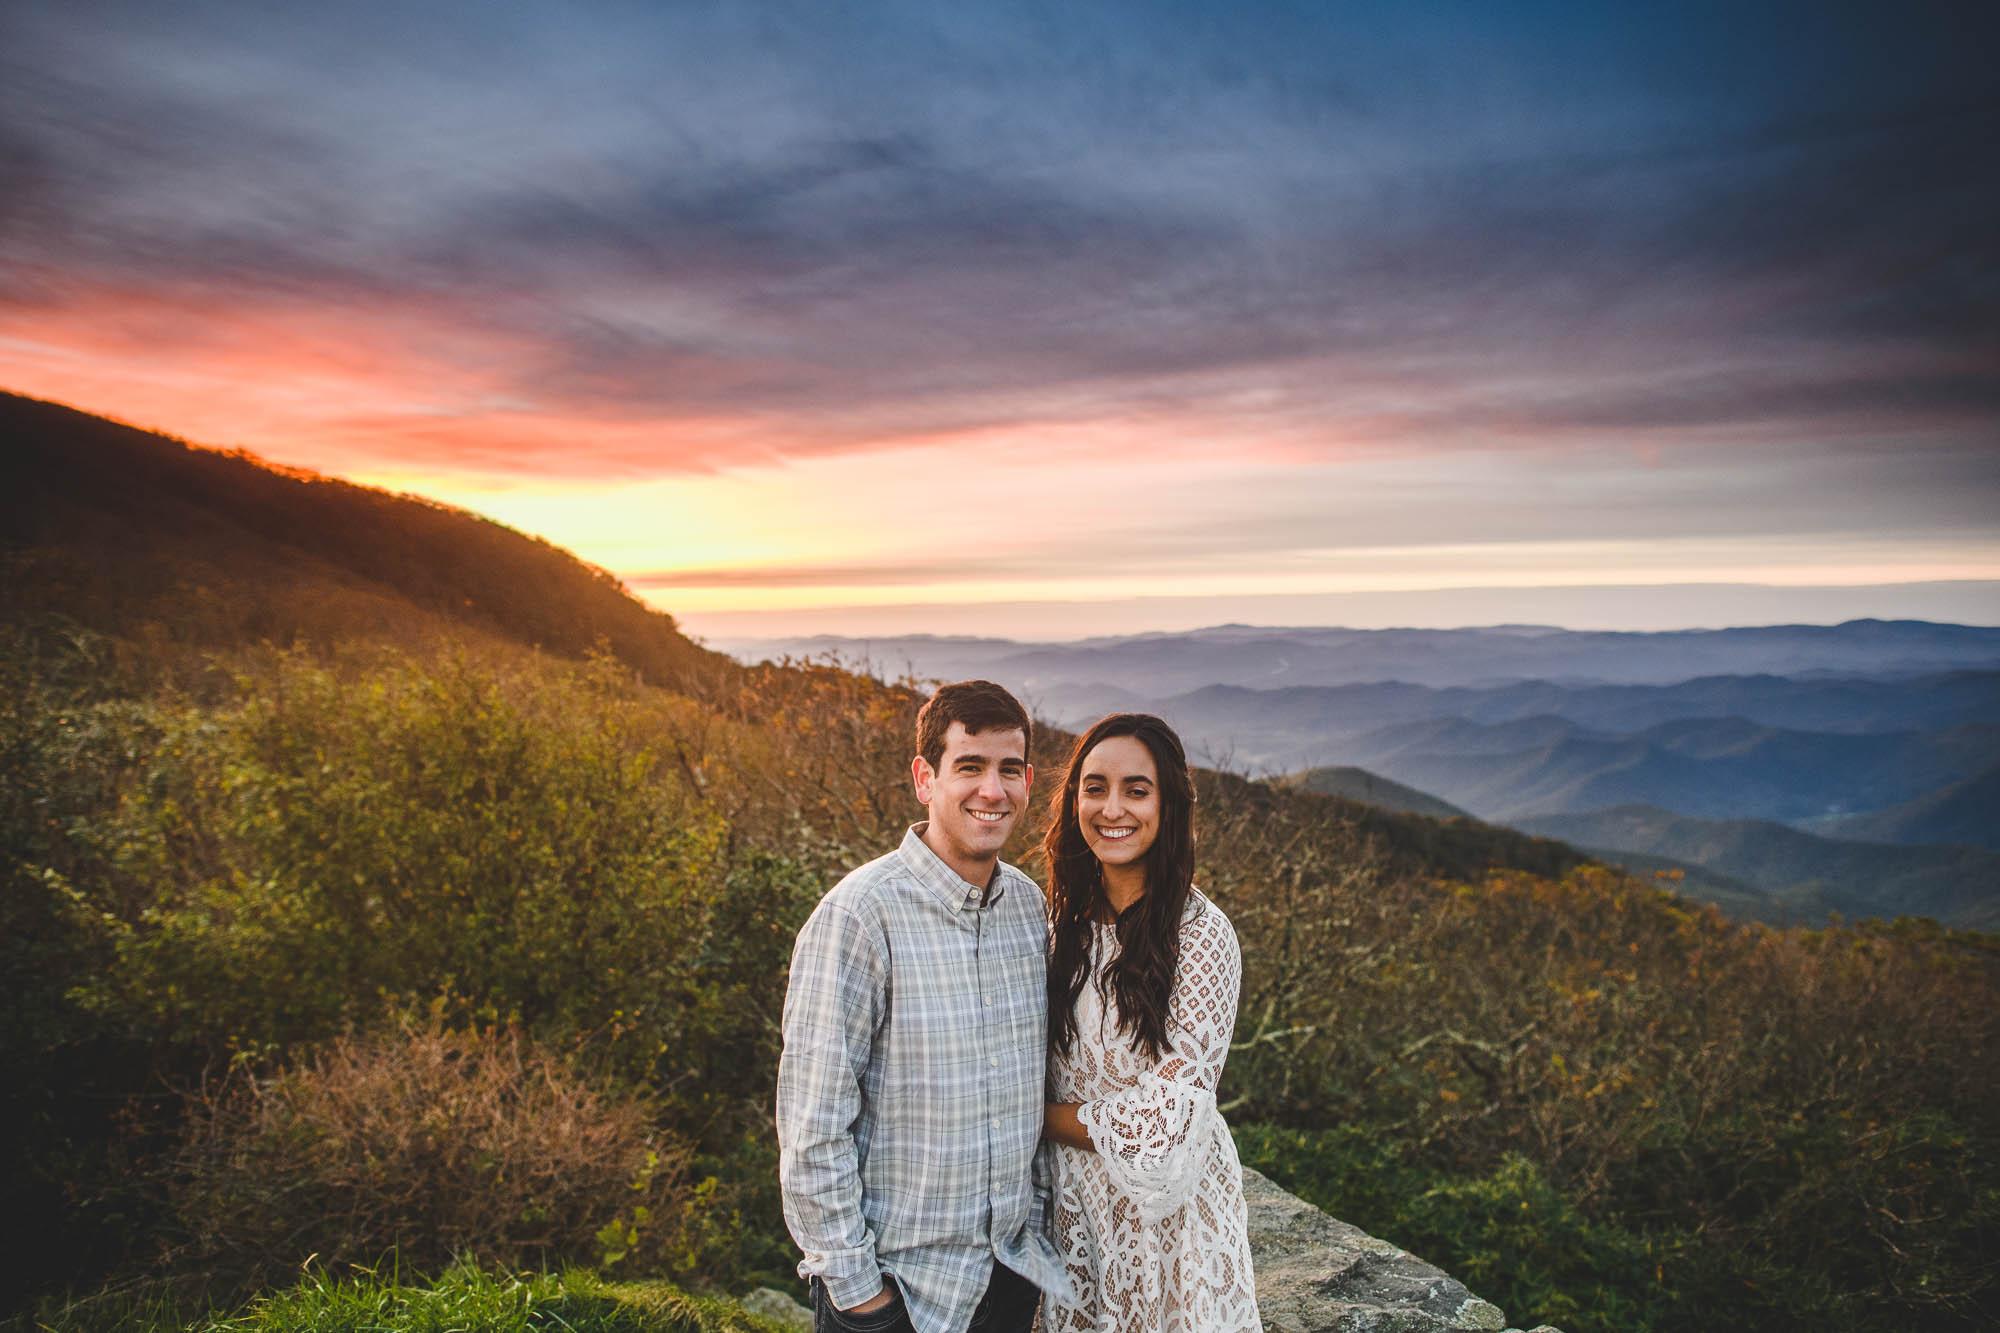 Craggy engagement sunset